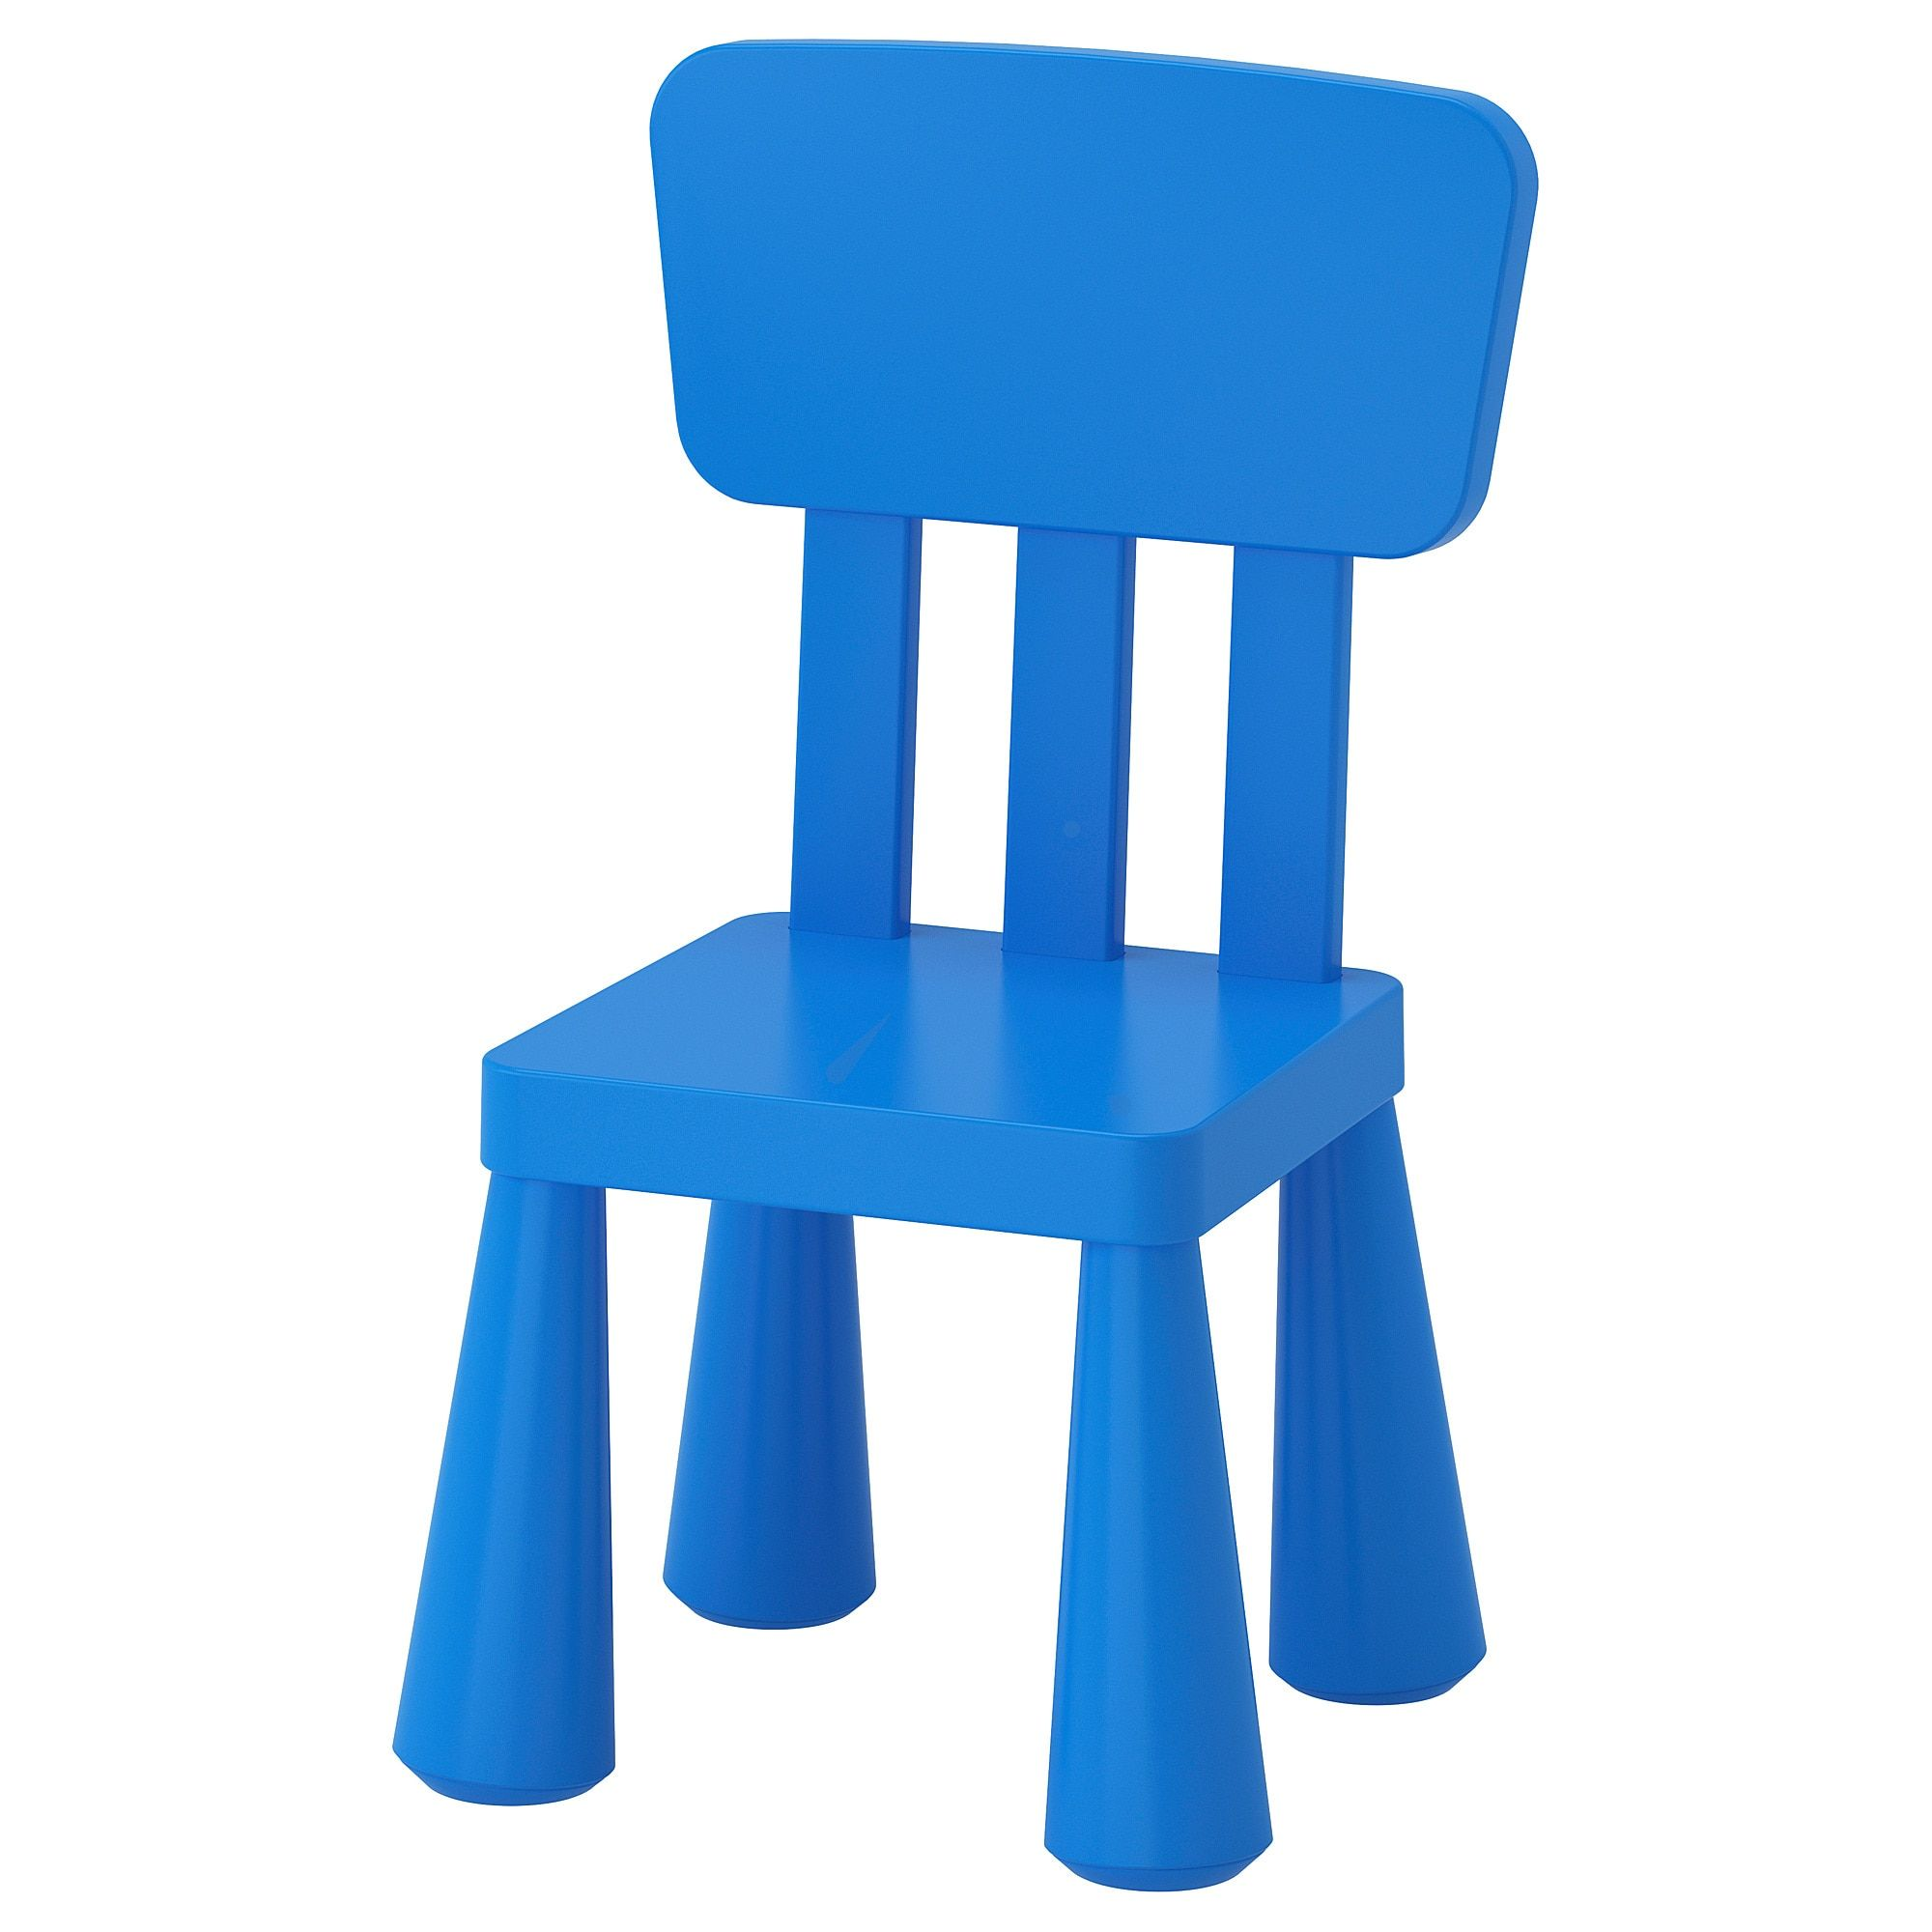 Mammut Children S Chair Indoor Outdoor Blue Ikea Childrens Chairs Indoor Chairs Kids Chairs